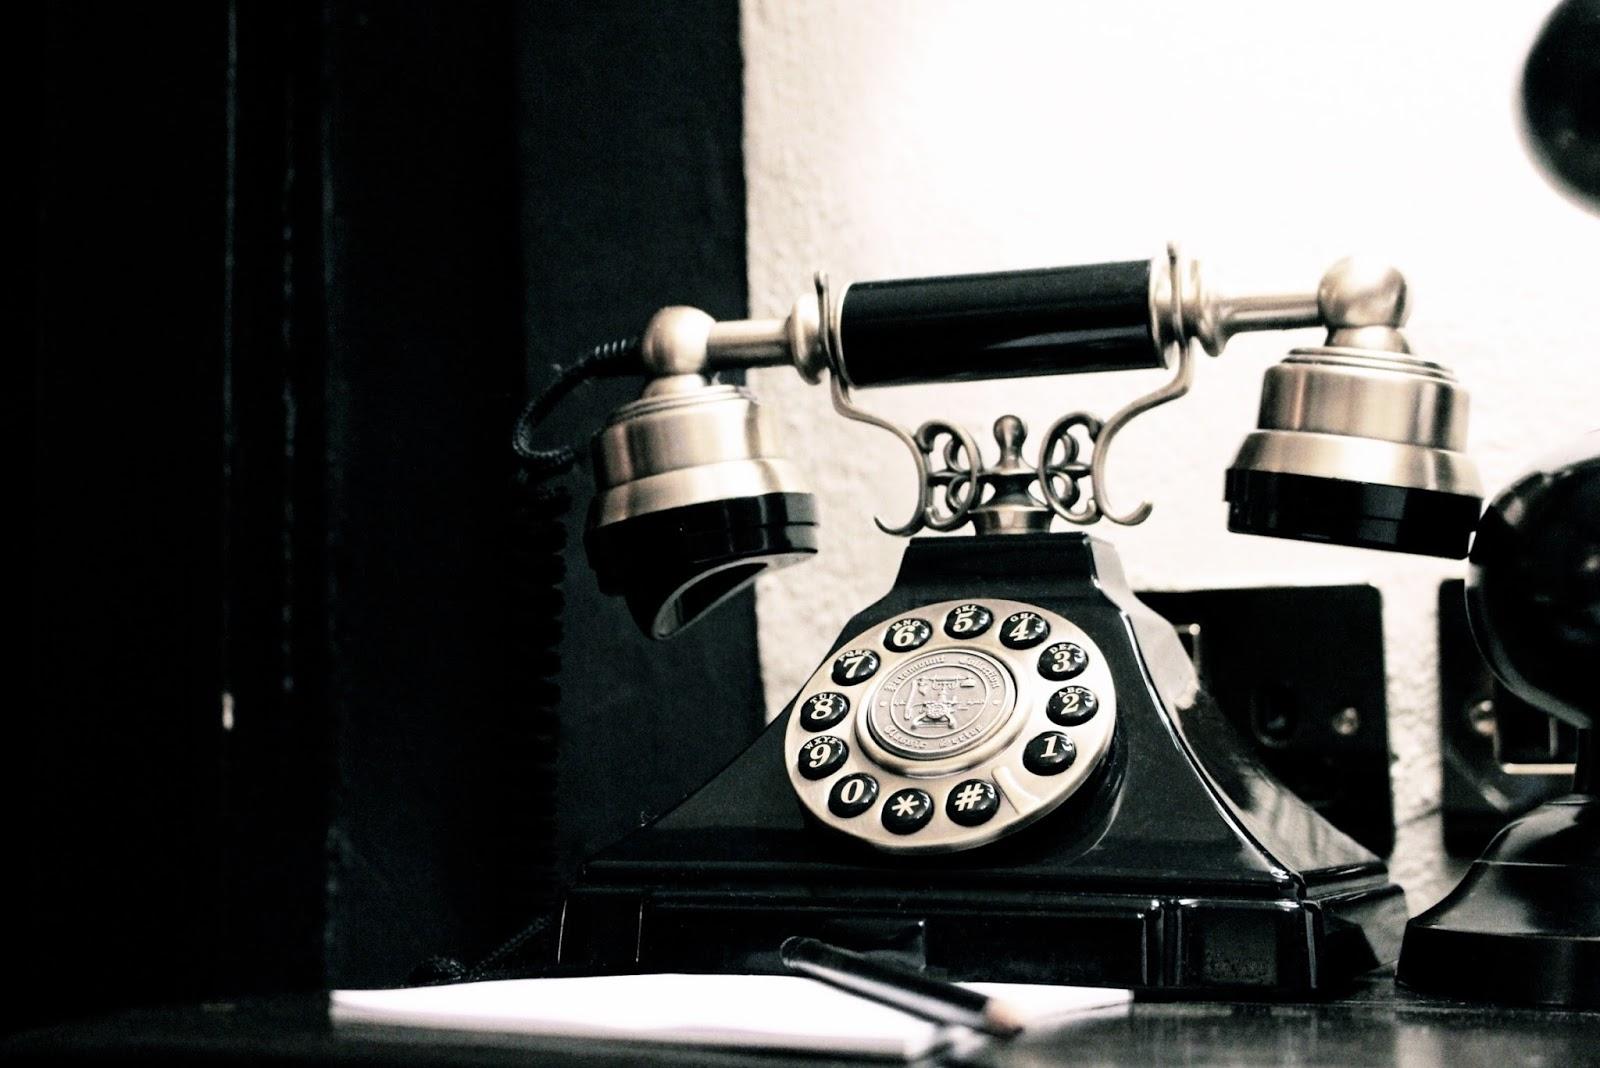 Old fashioned black telephone